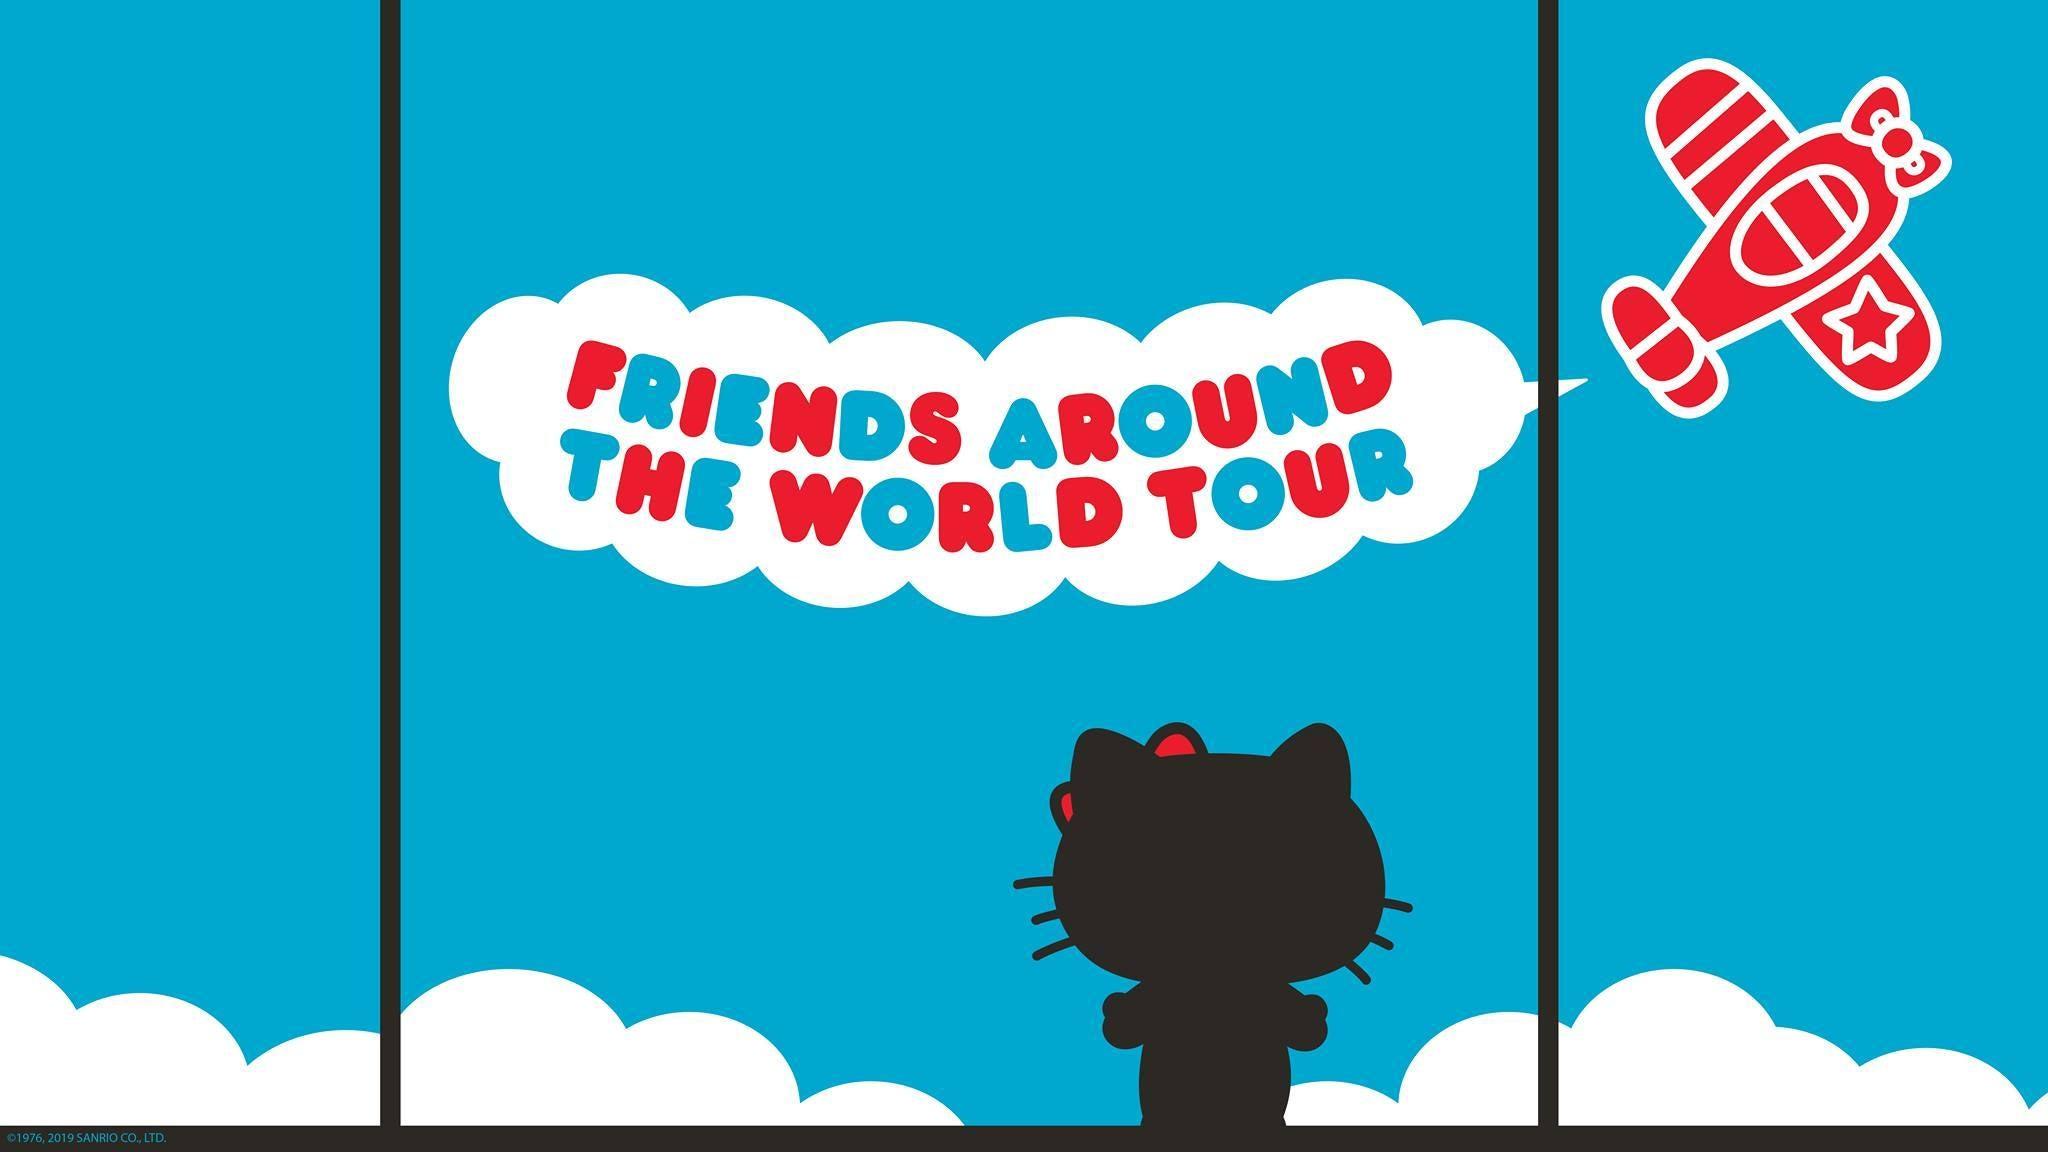 Hello Kitty Friends Around the World Tour